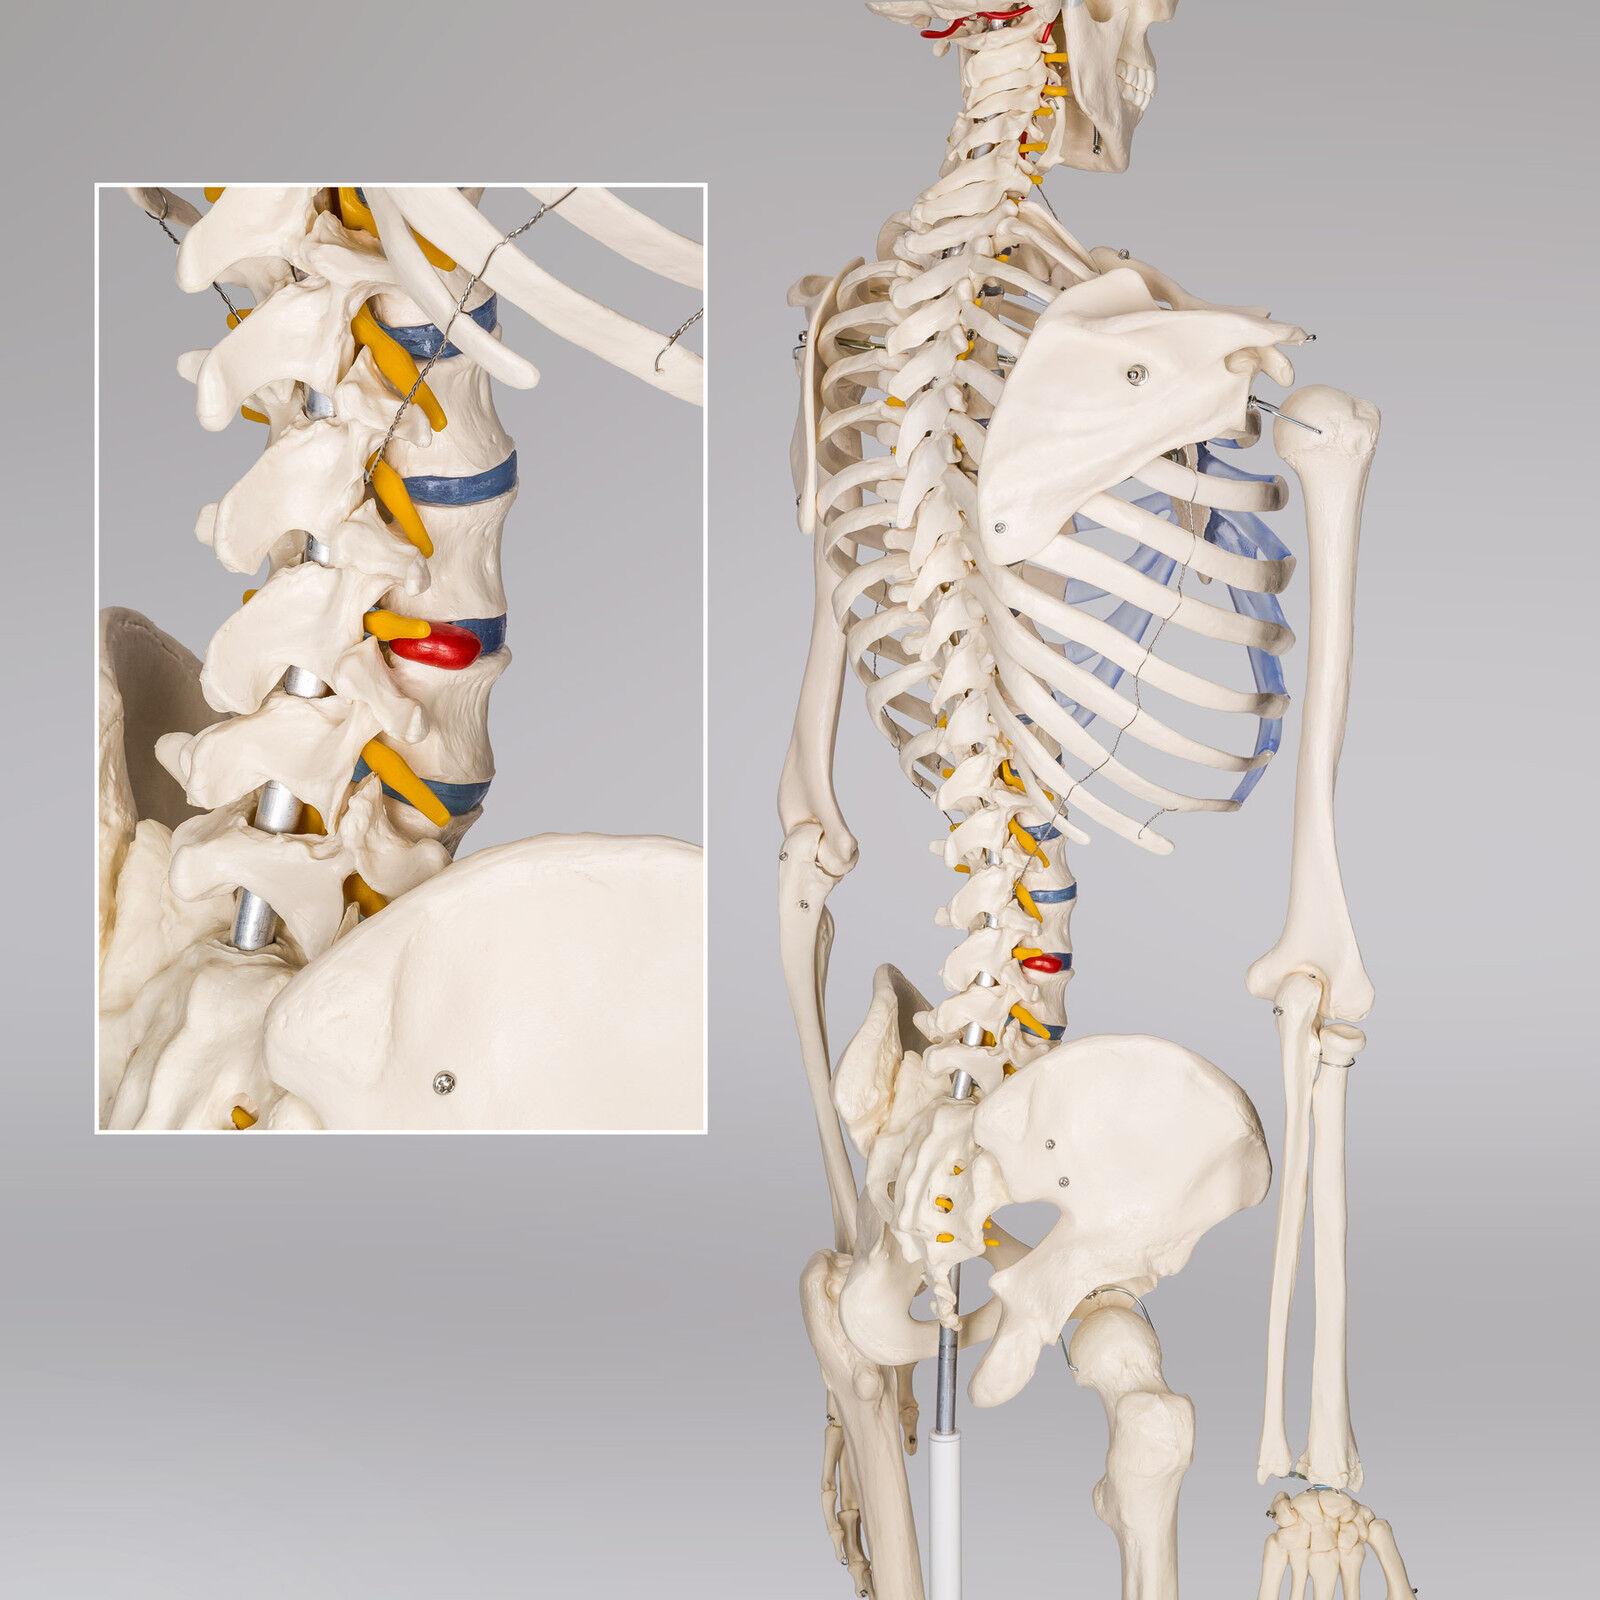 Human Skeleton Anatomical Model Life Size 181cm Medical Poster